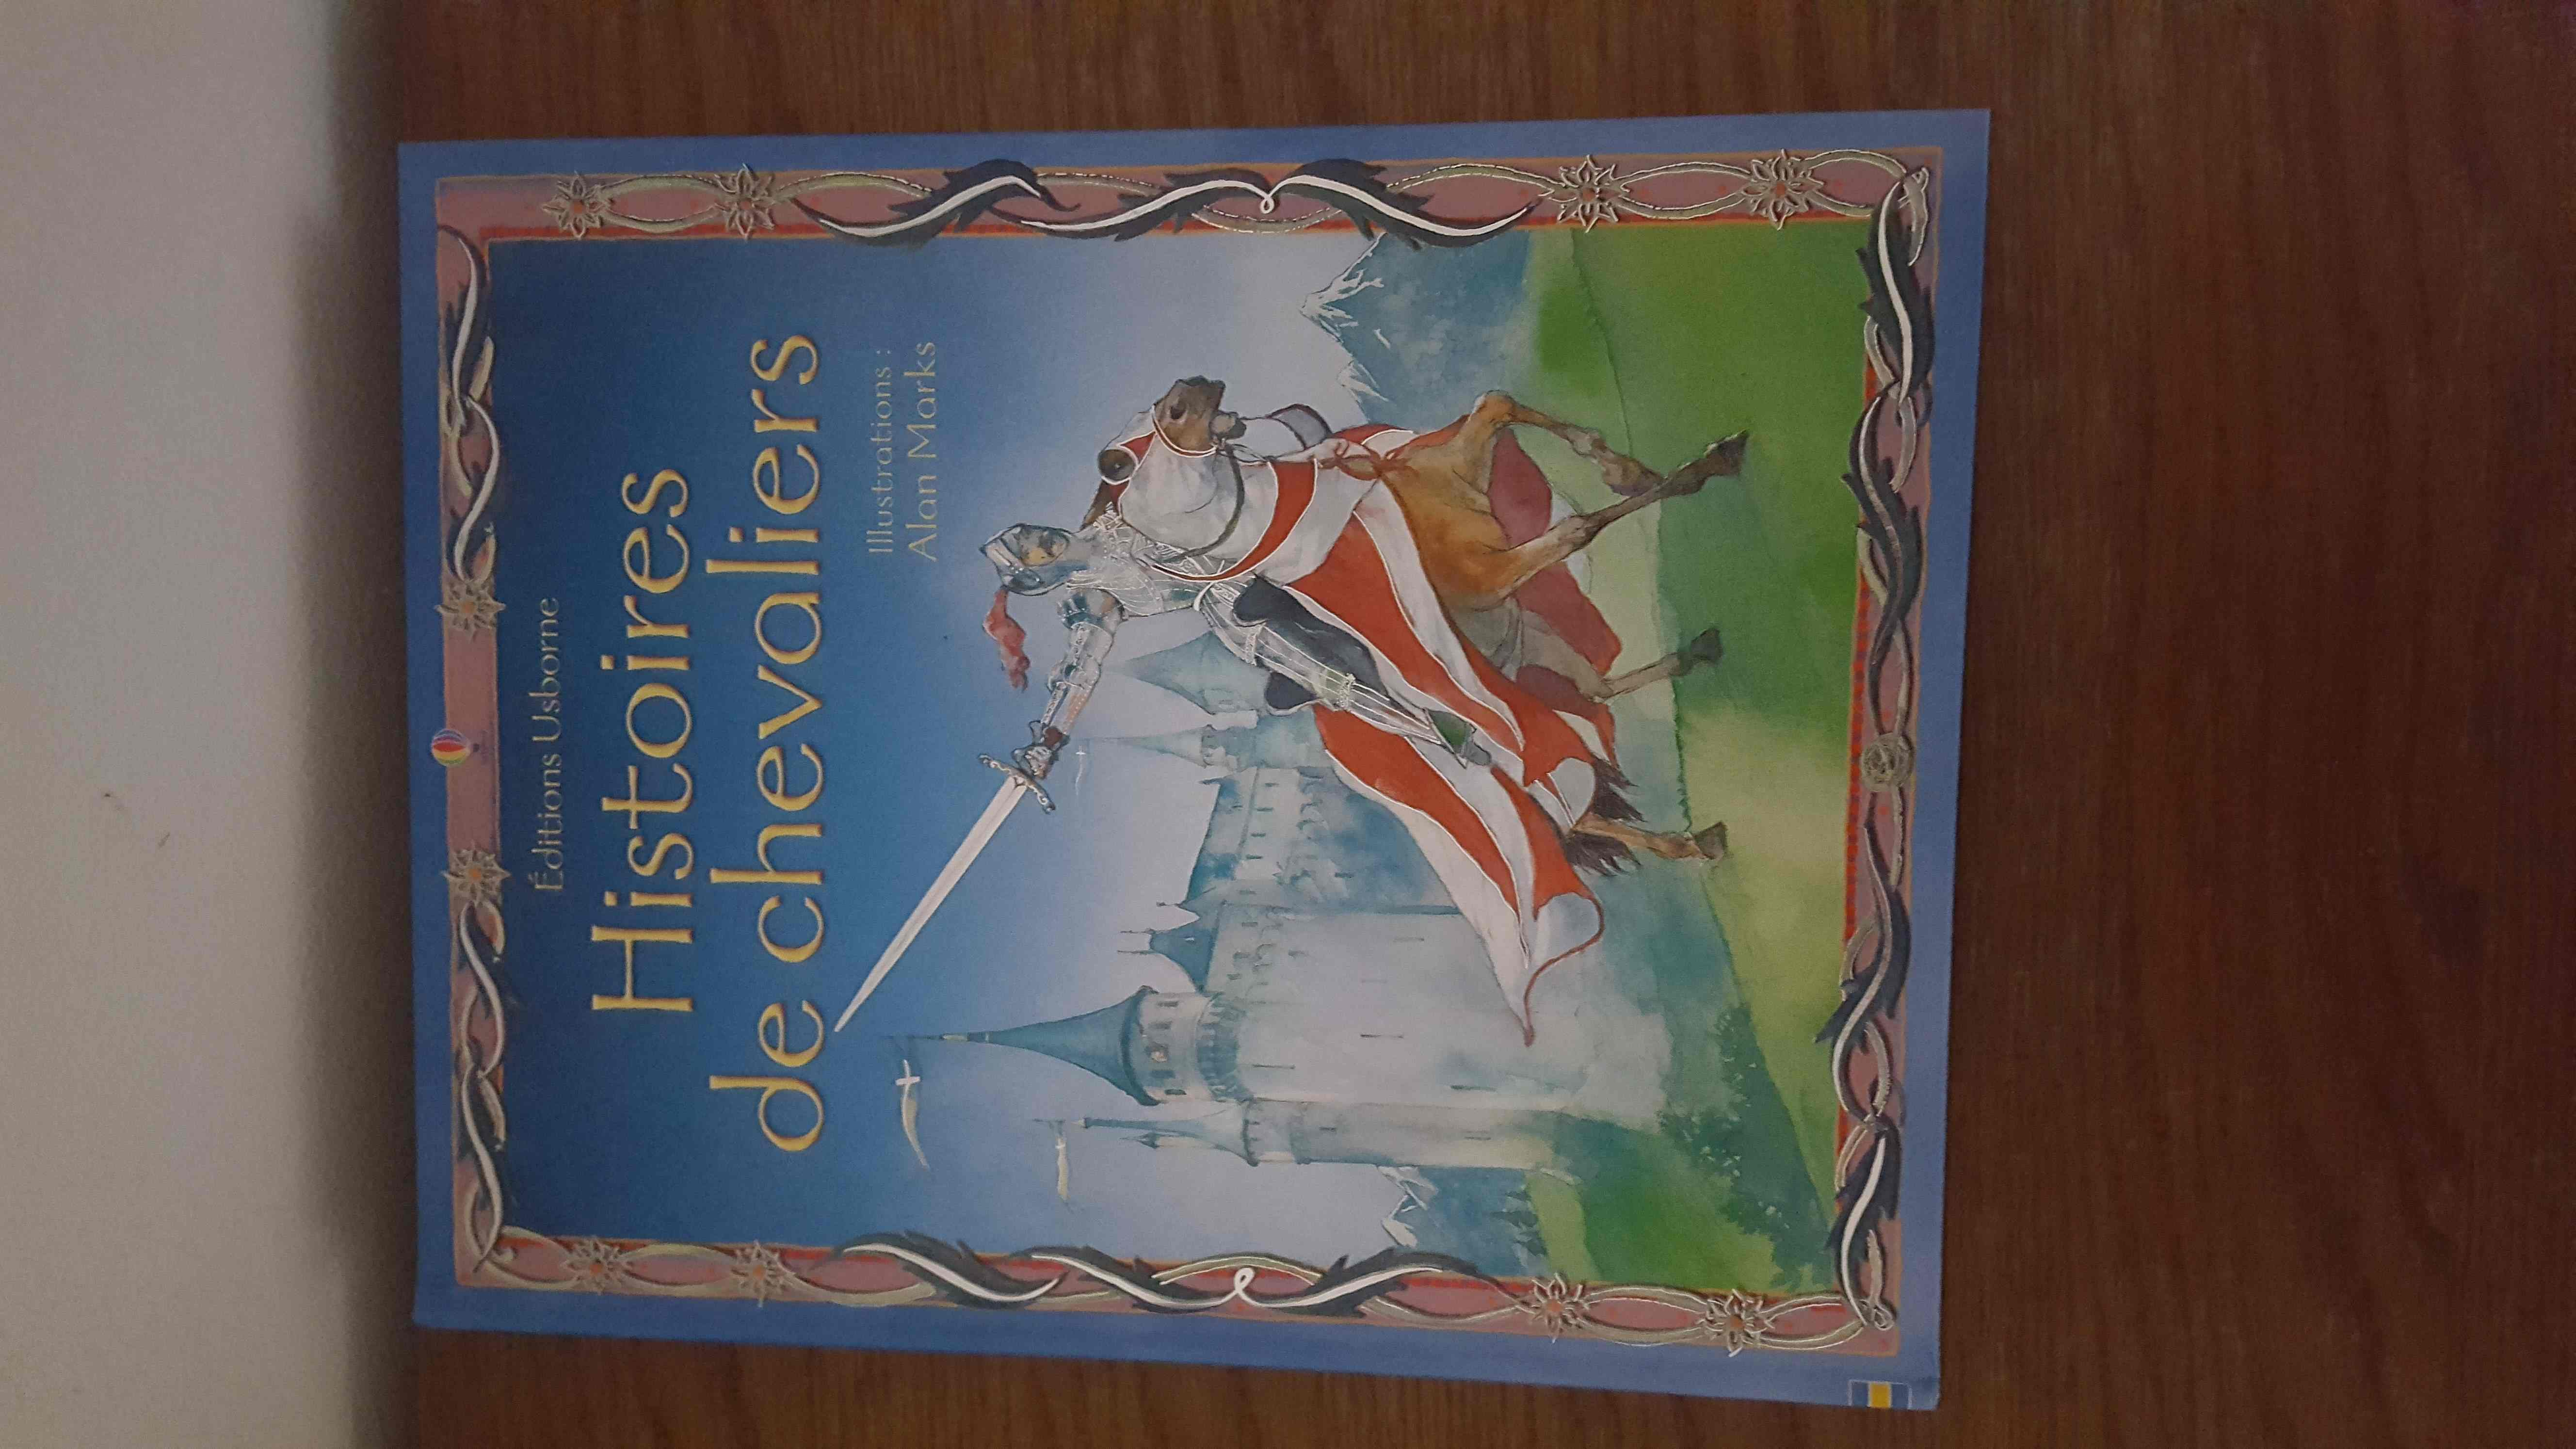 Histoire de chevalier 10 Sens (89)